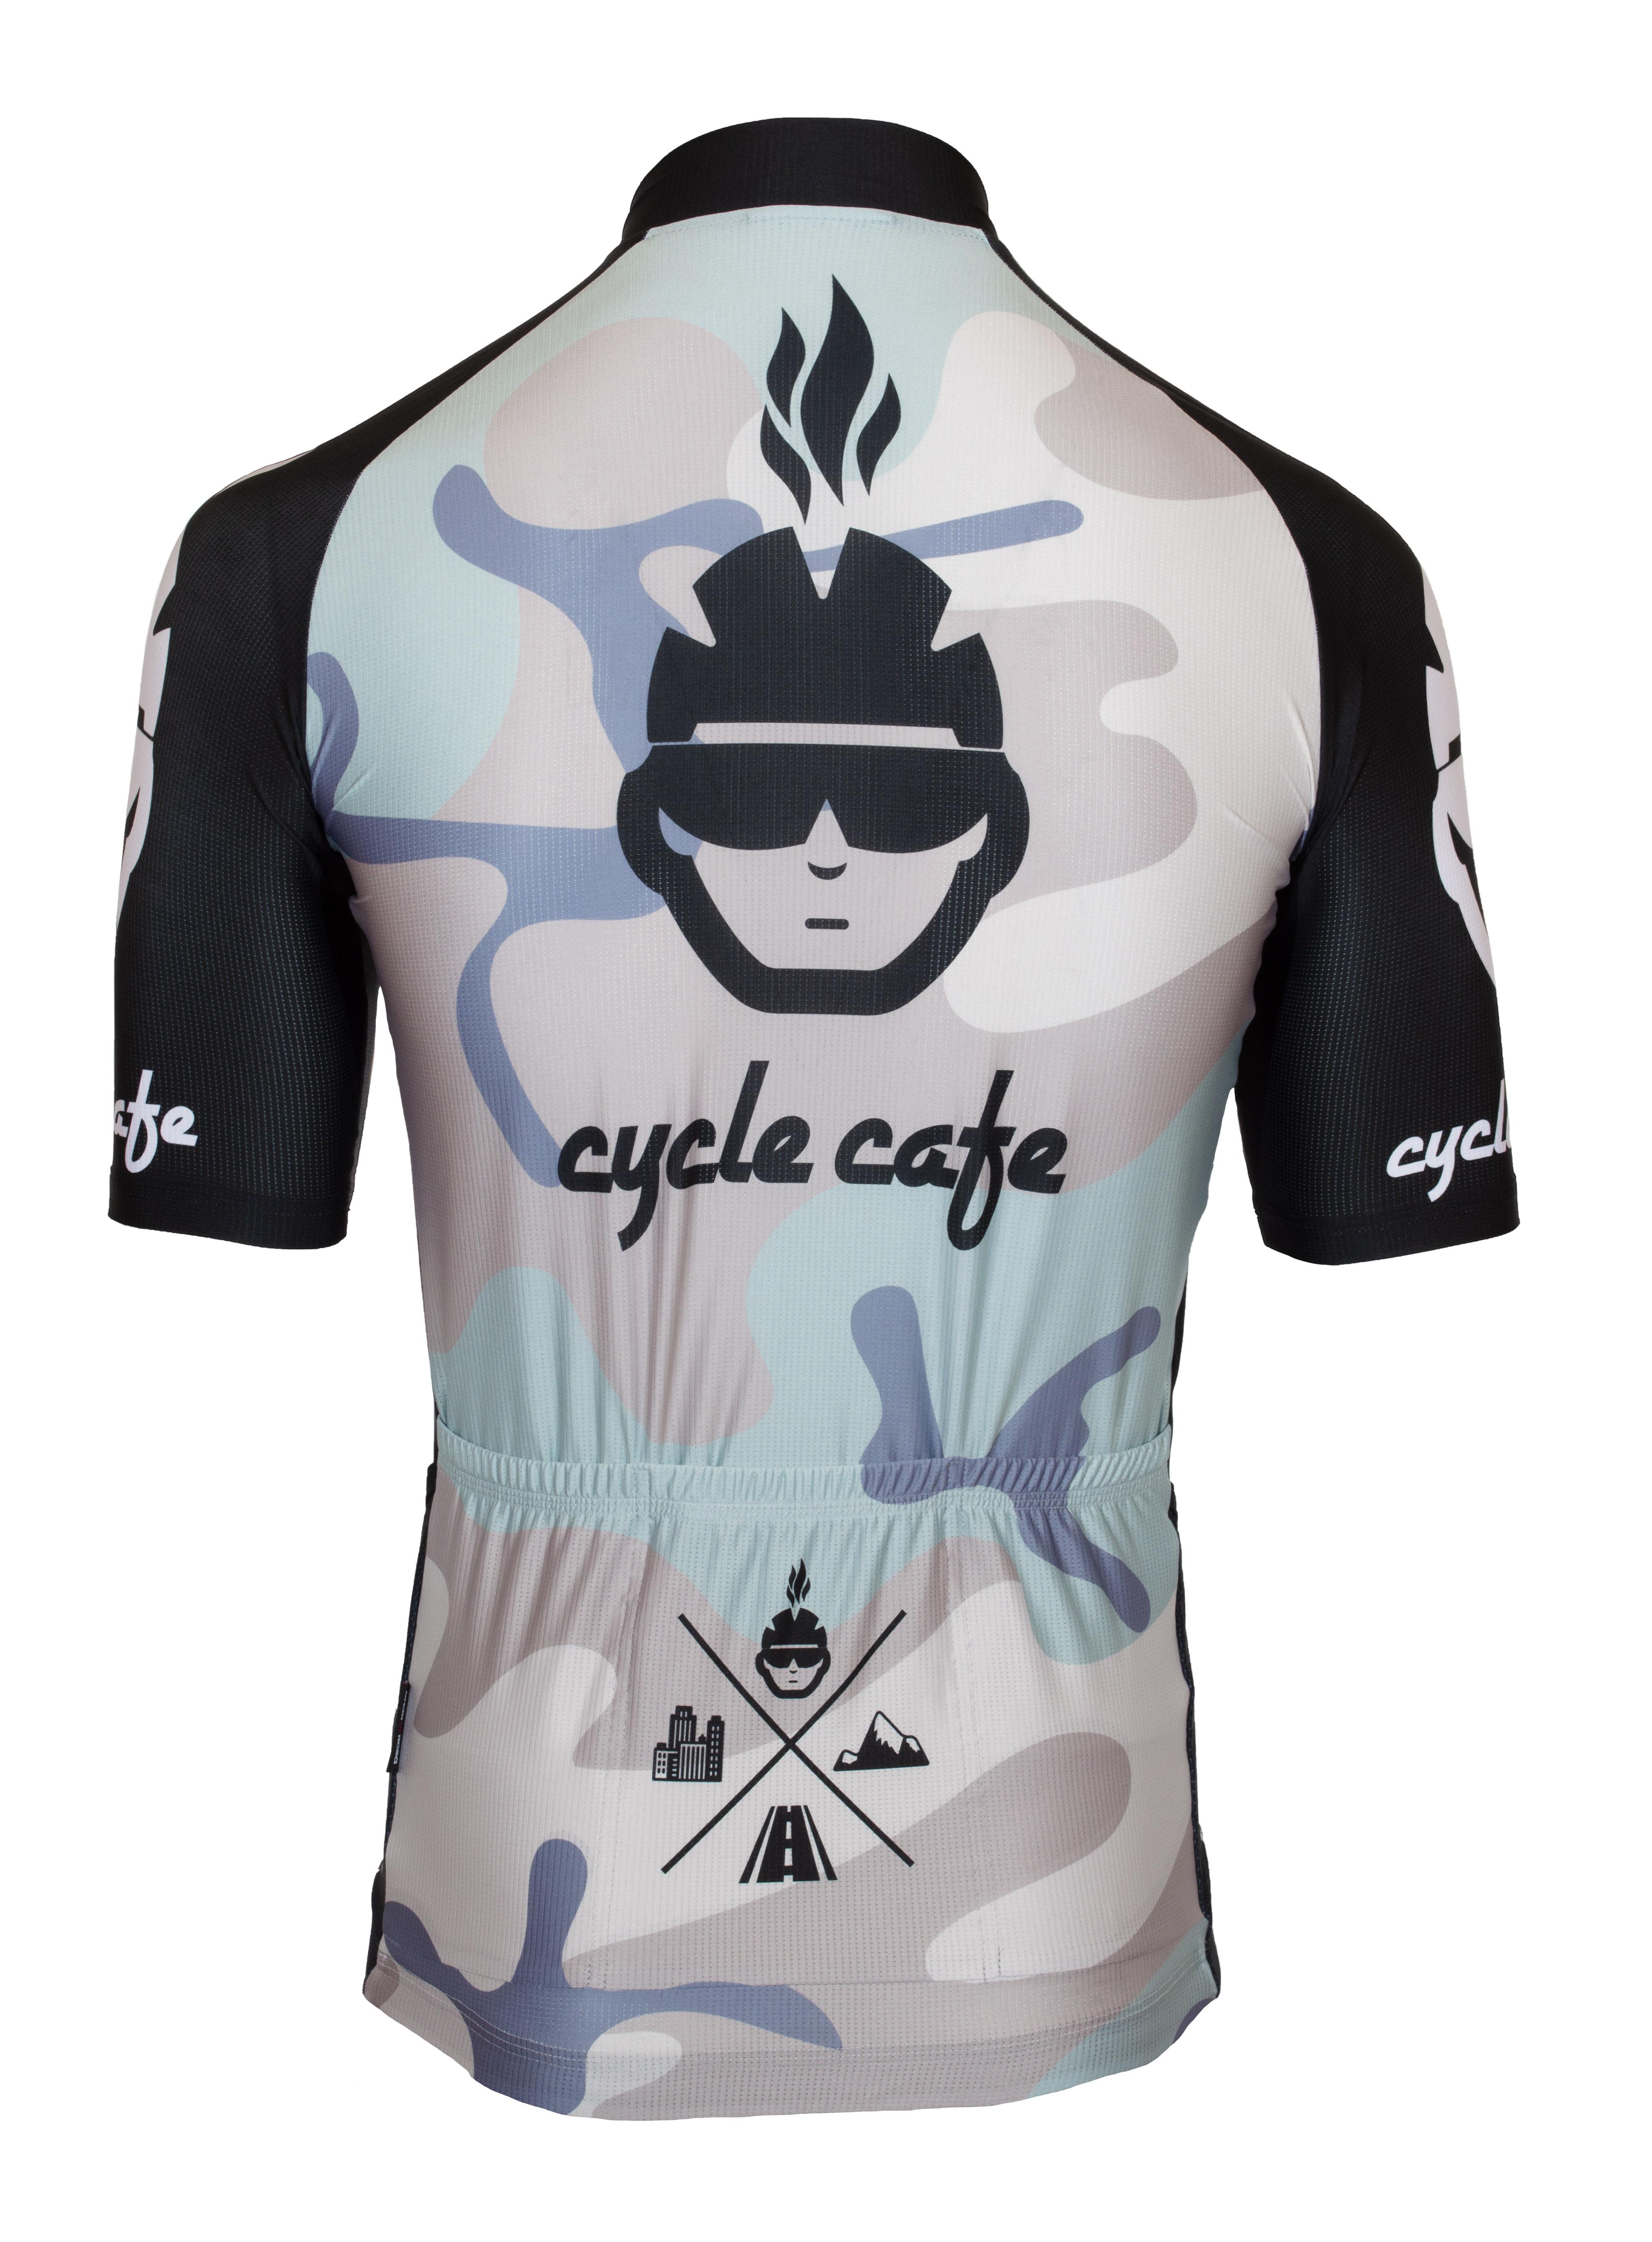 Kurzarm Radtrikot RRT047M / Cycle Cafe Gravel Trikot